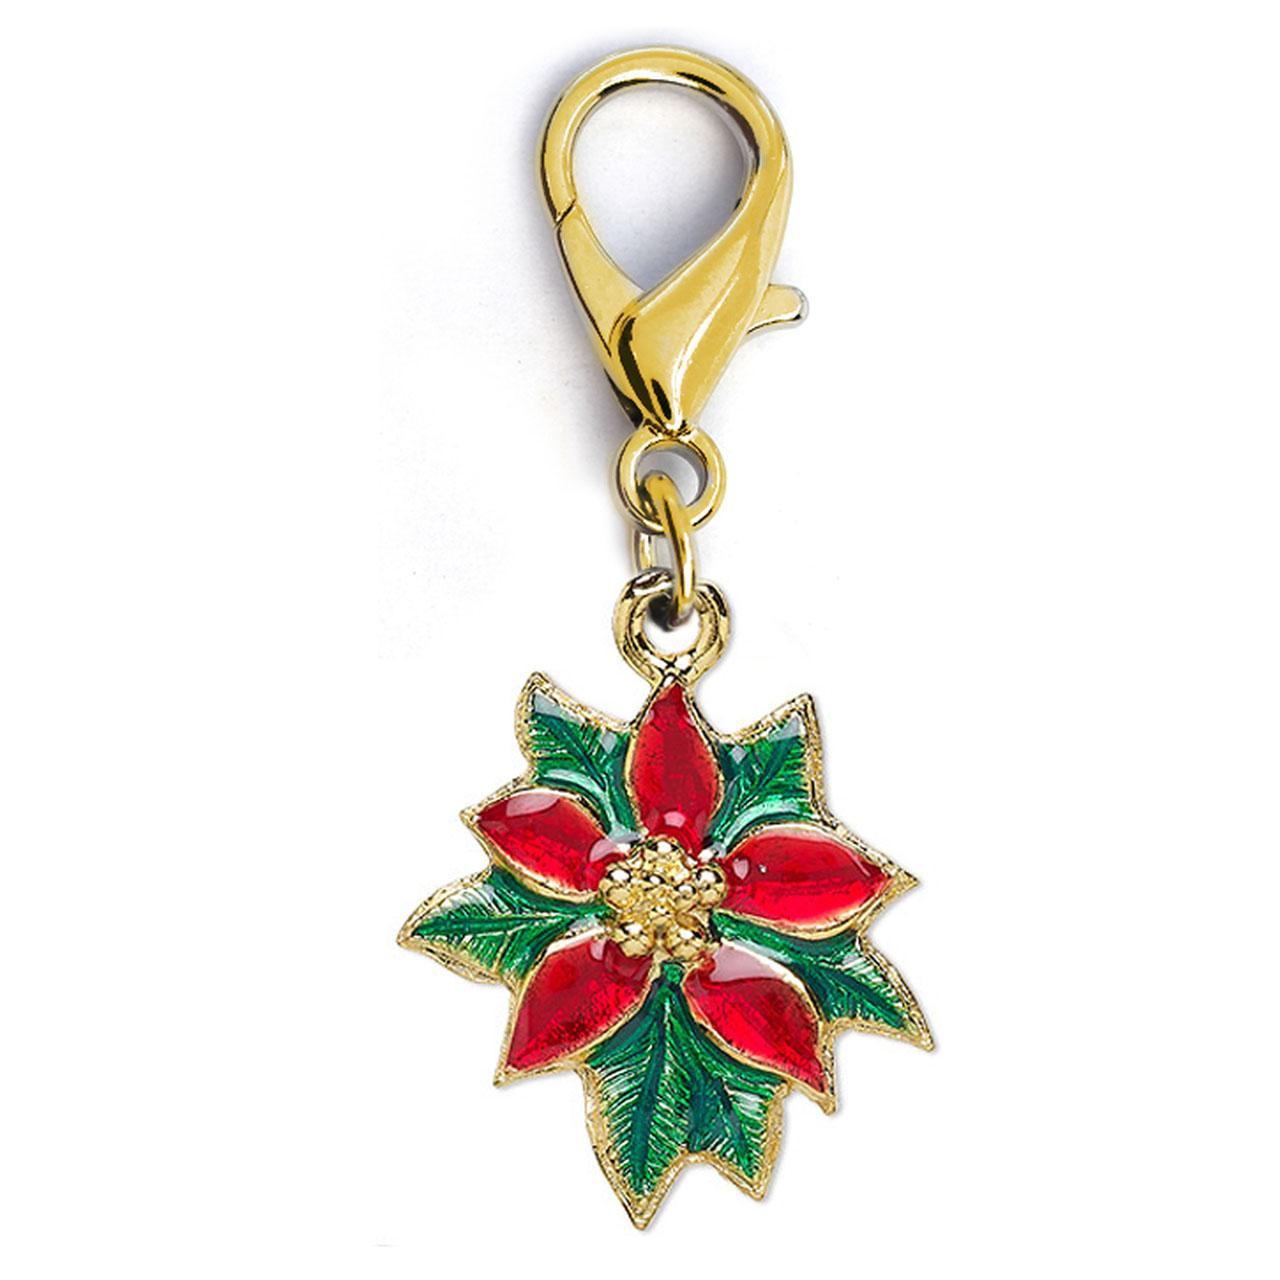 Christmas Poinsettia Dog Collar Charm by Diva Dog - Gold